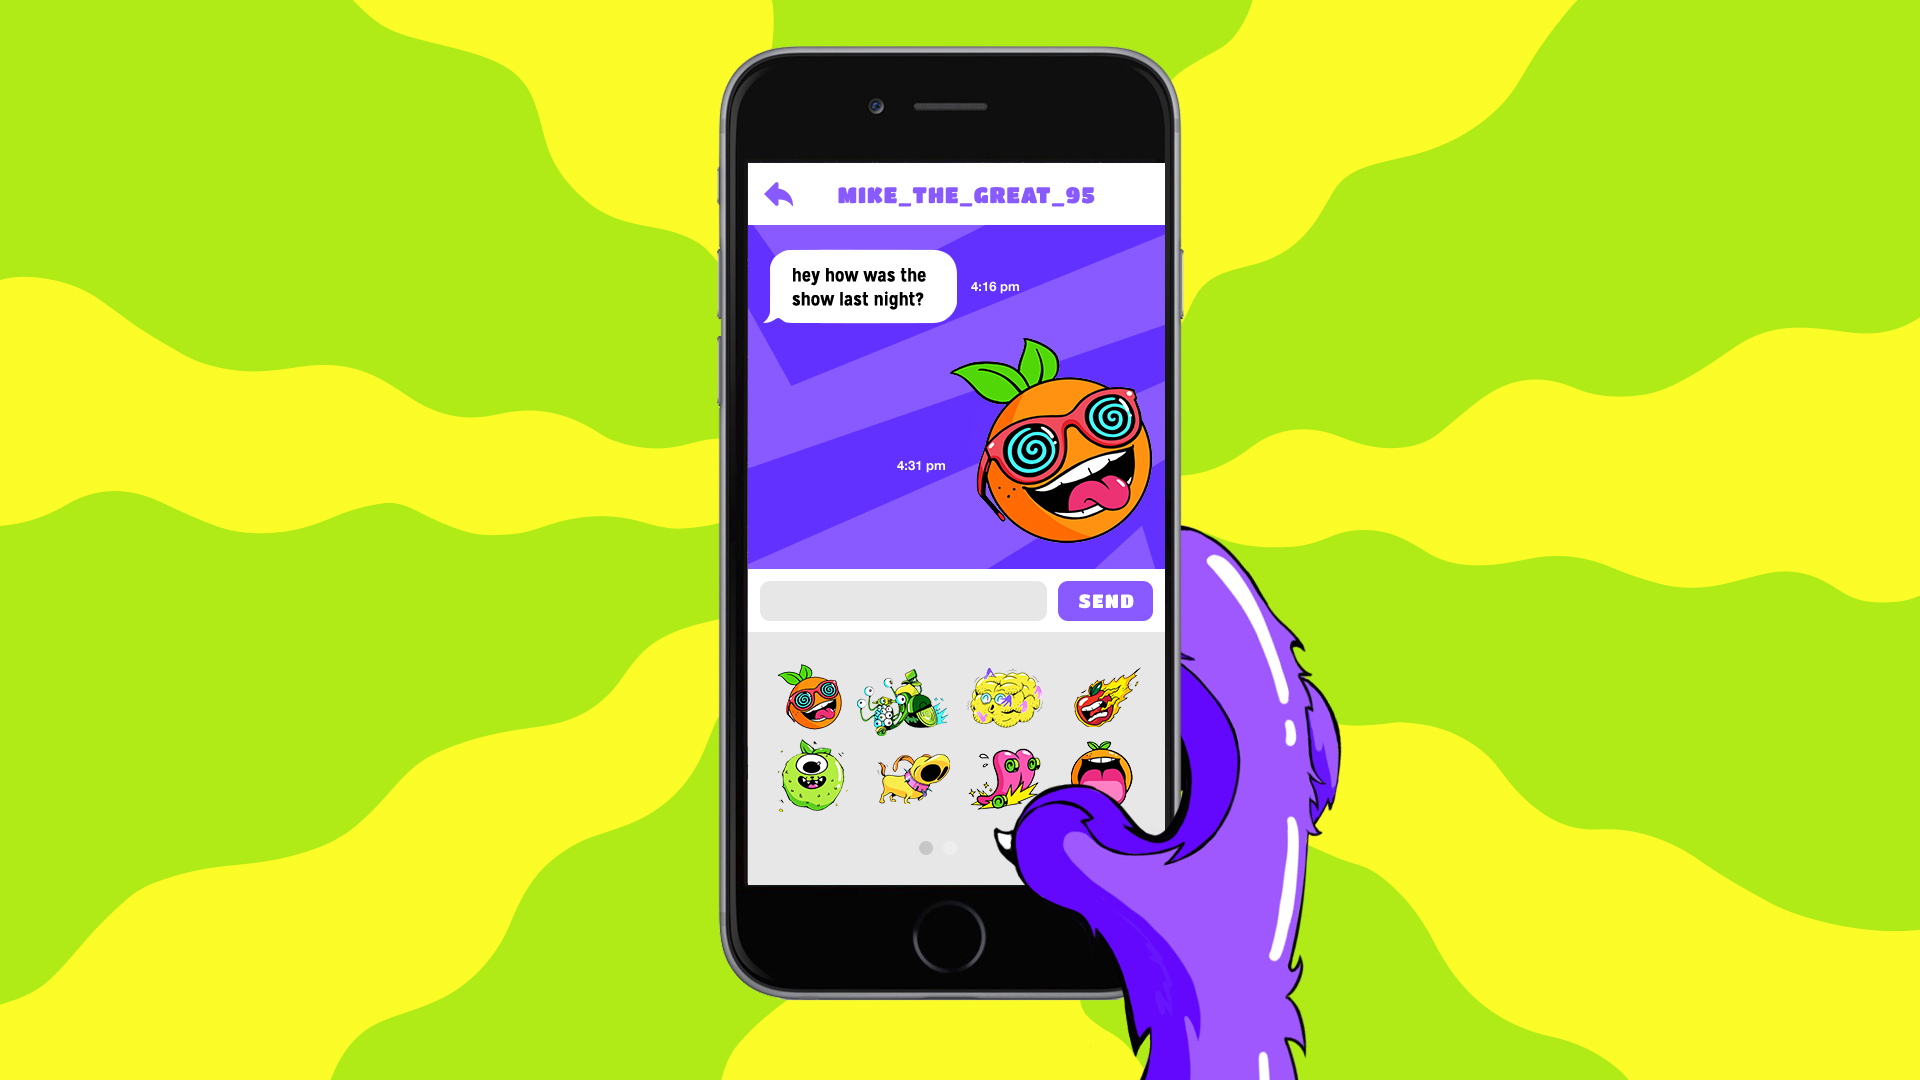 Sticker pack for messaging platforms